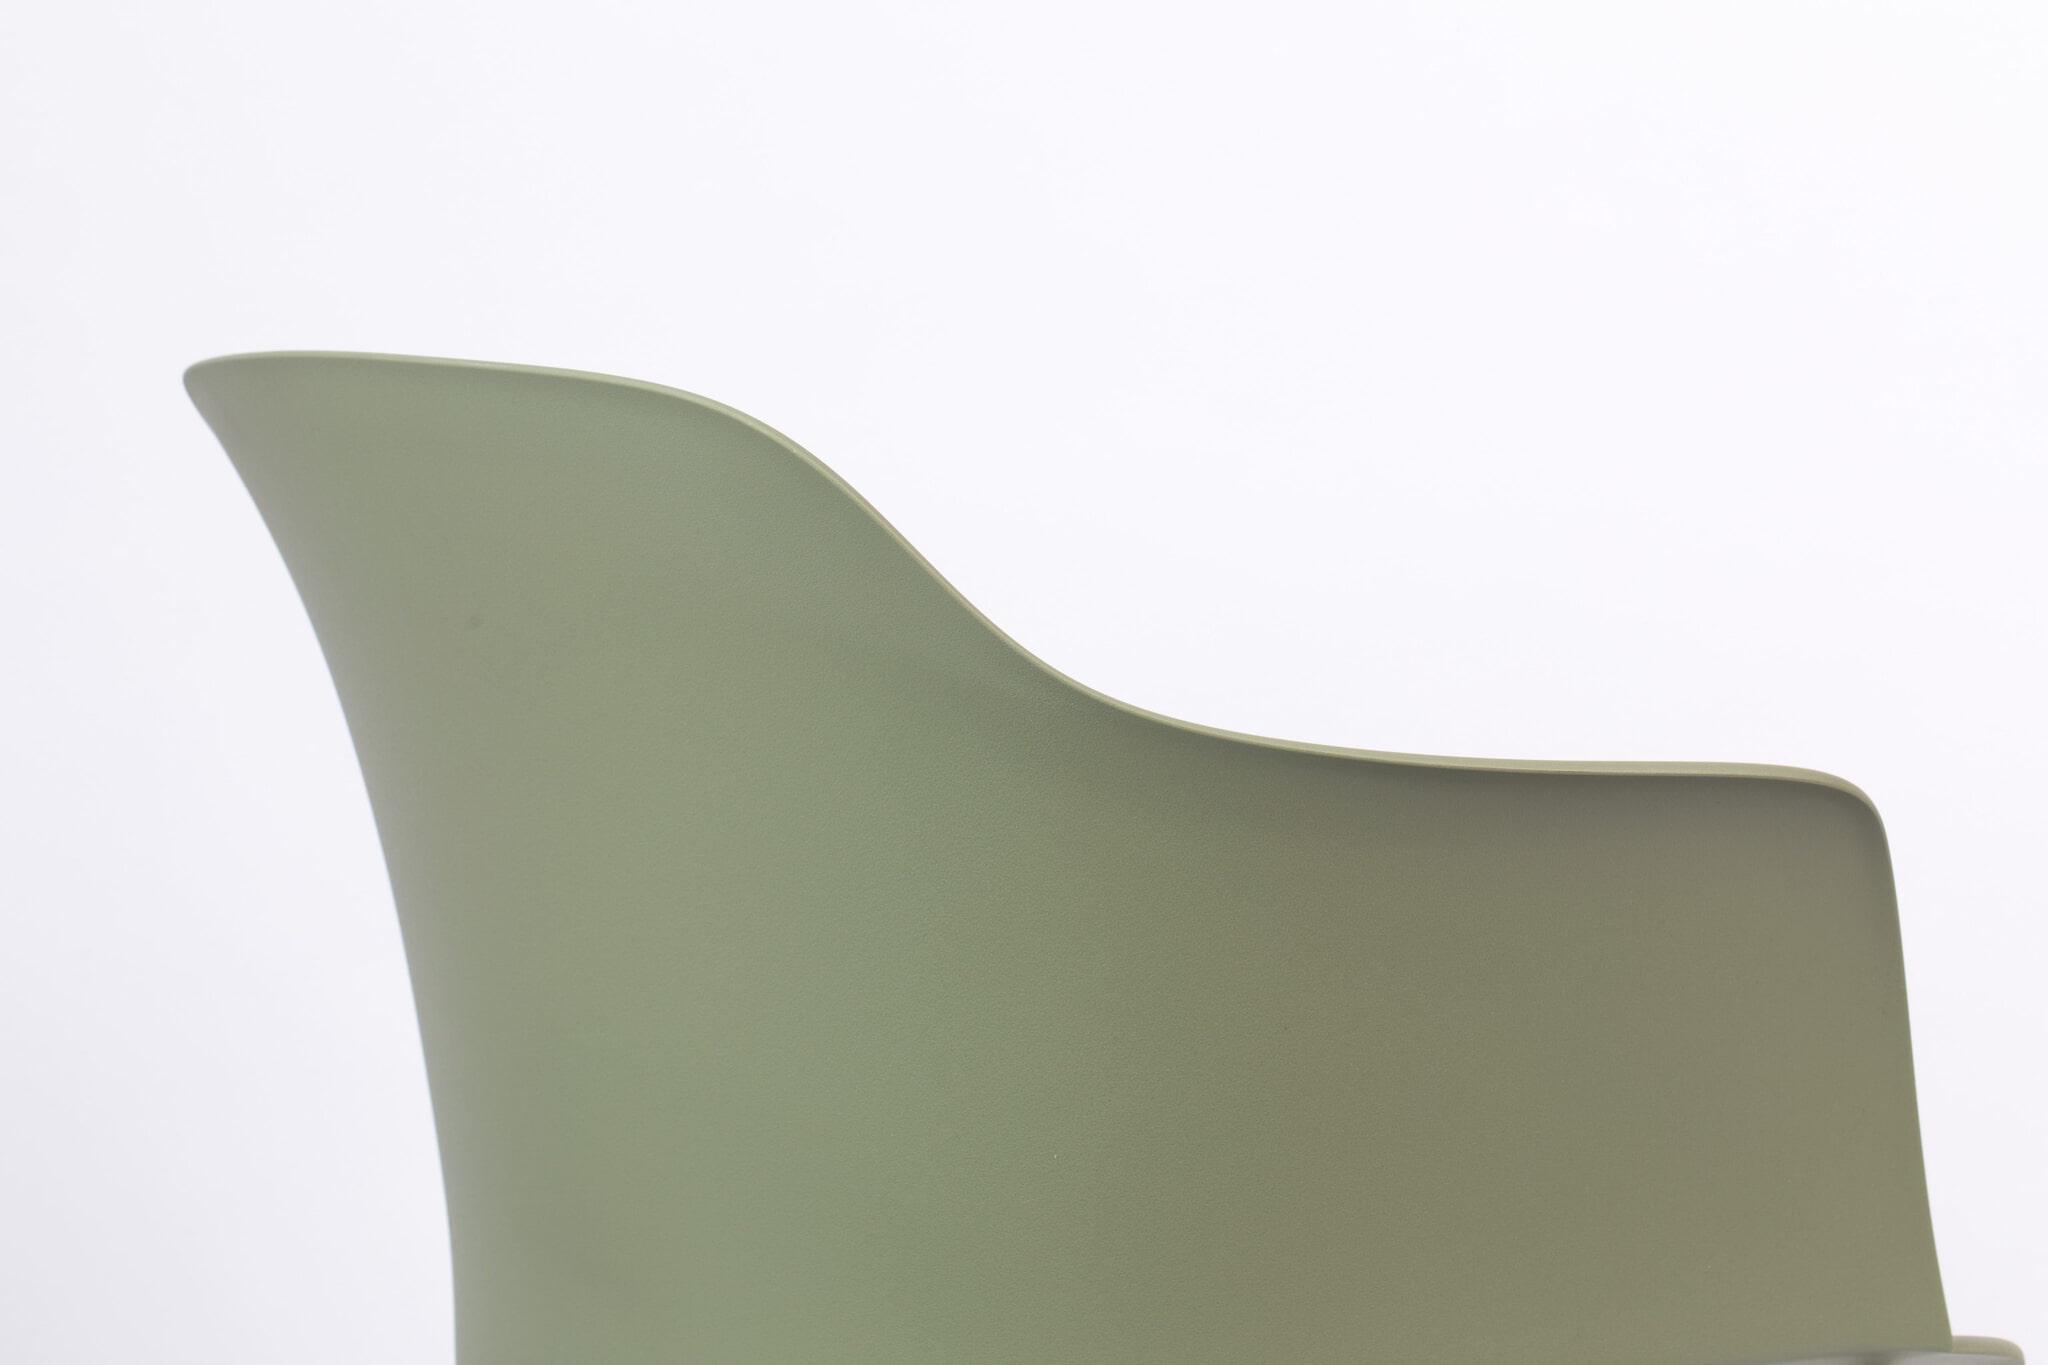 Eetkamer Stoel Groen : Zilt eetkamerstoel hallander kleur groen wll 1200176 meubelpartner